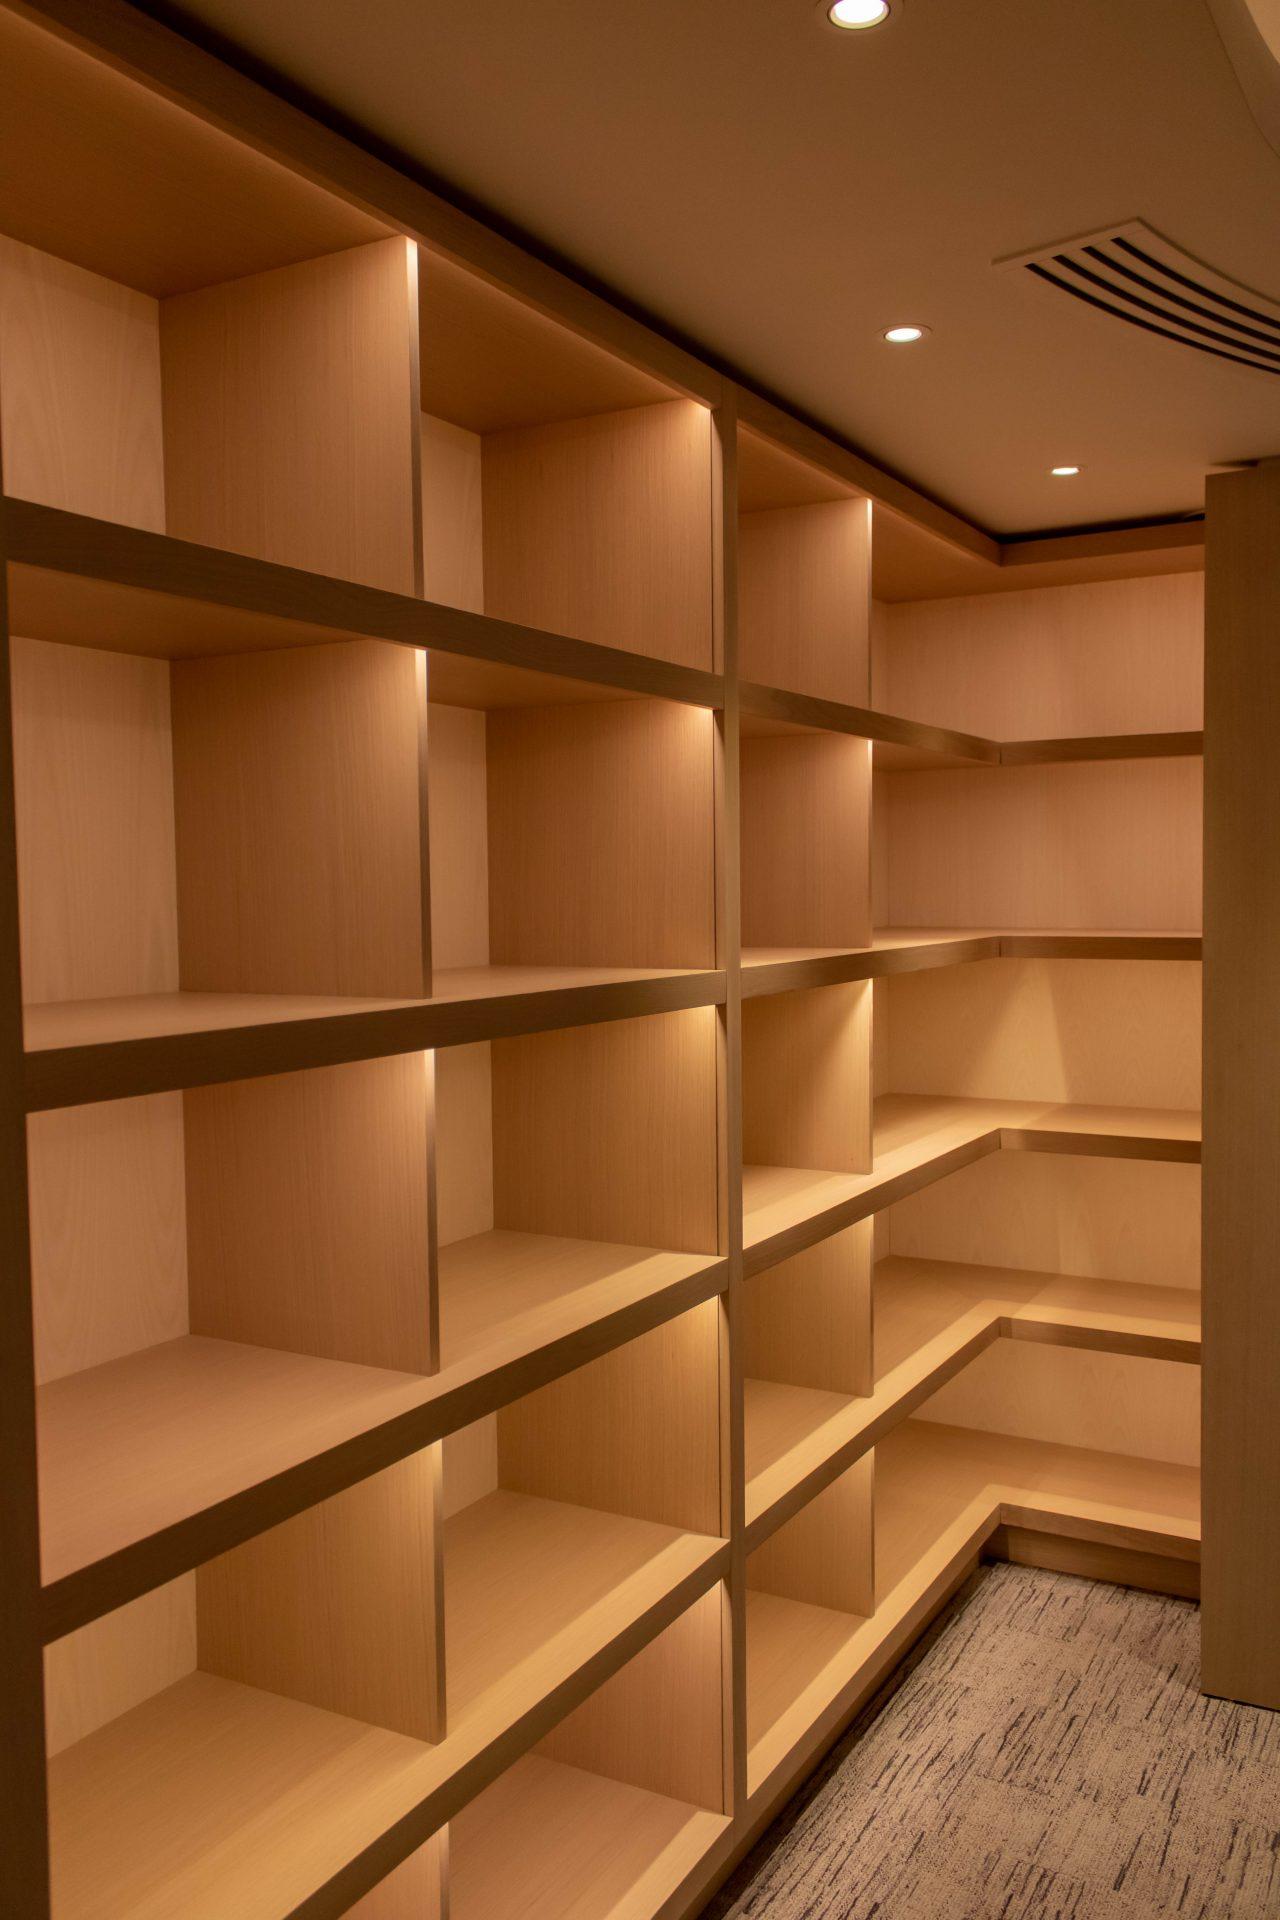 kandd cabinetry interior design